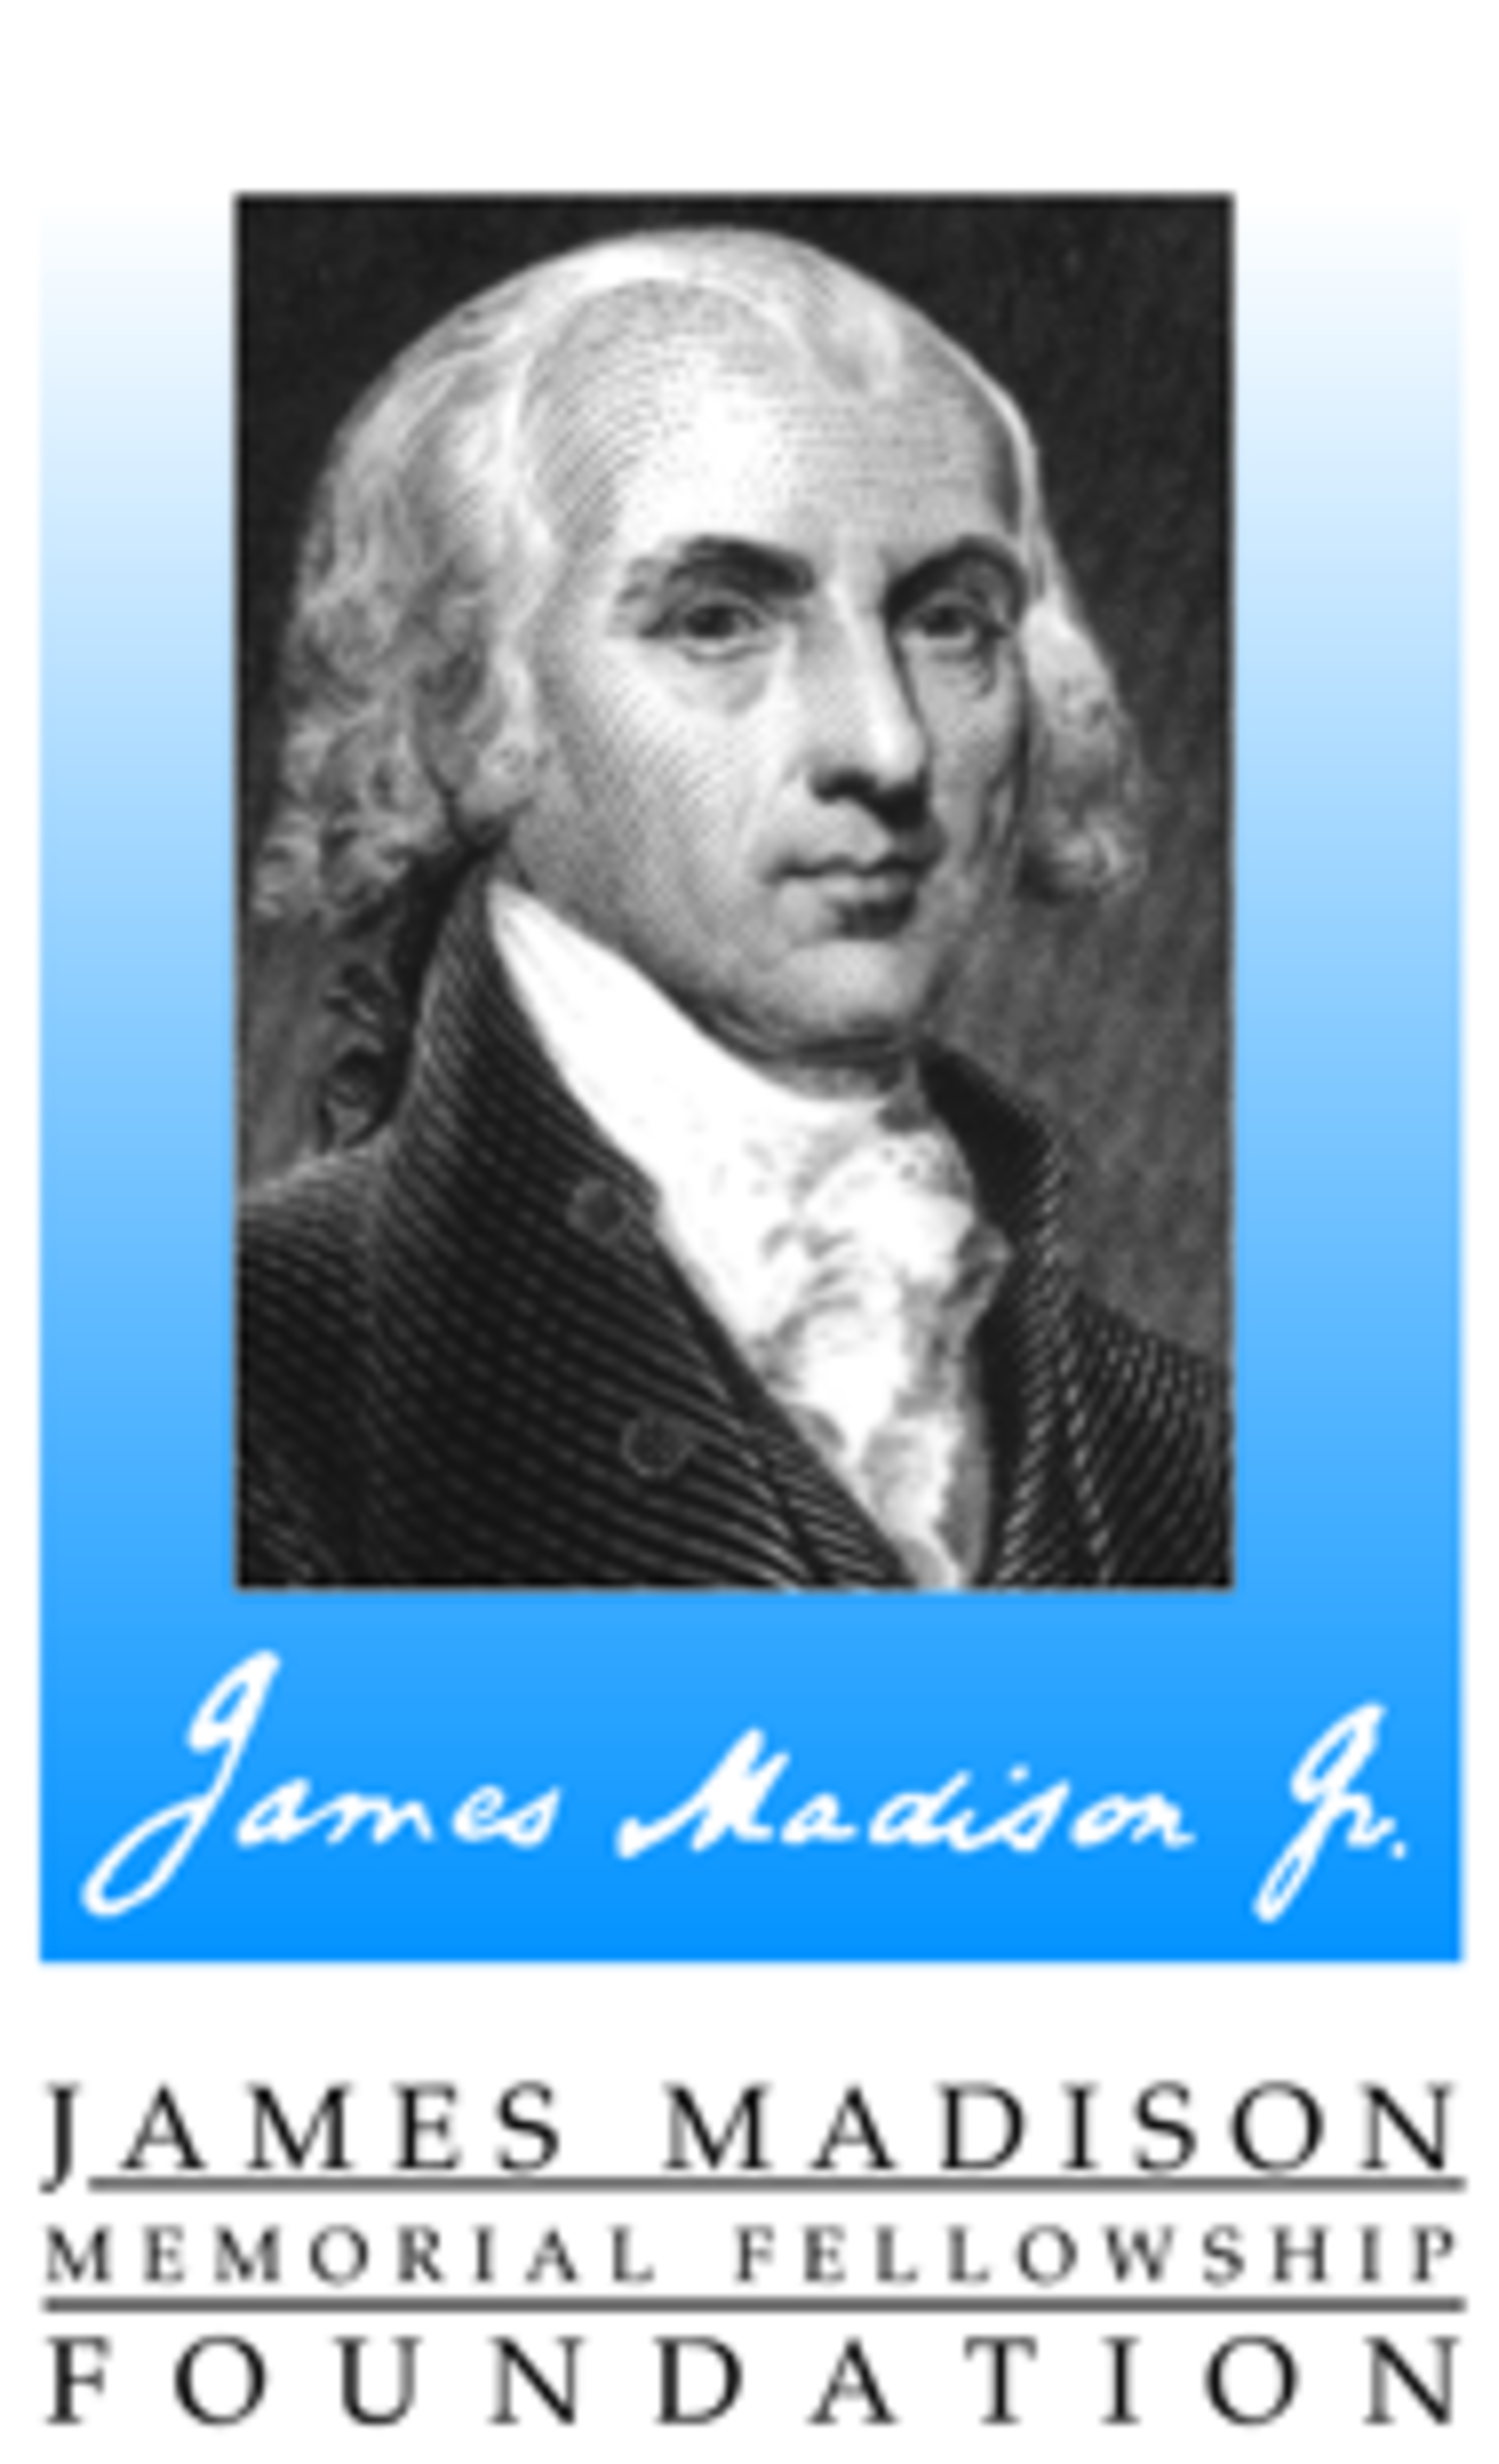 James Madison Memorial Fellowship Foundation Wikipedia